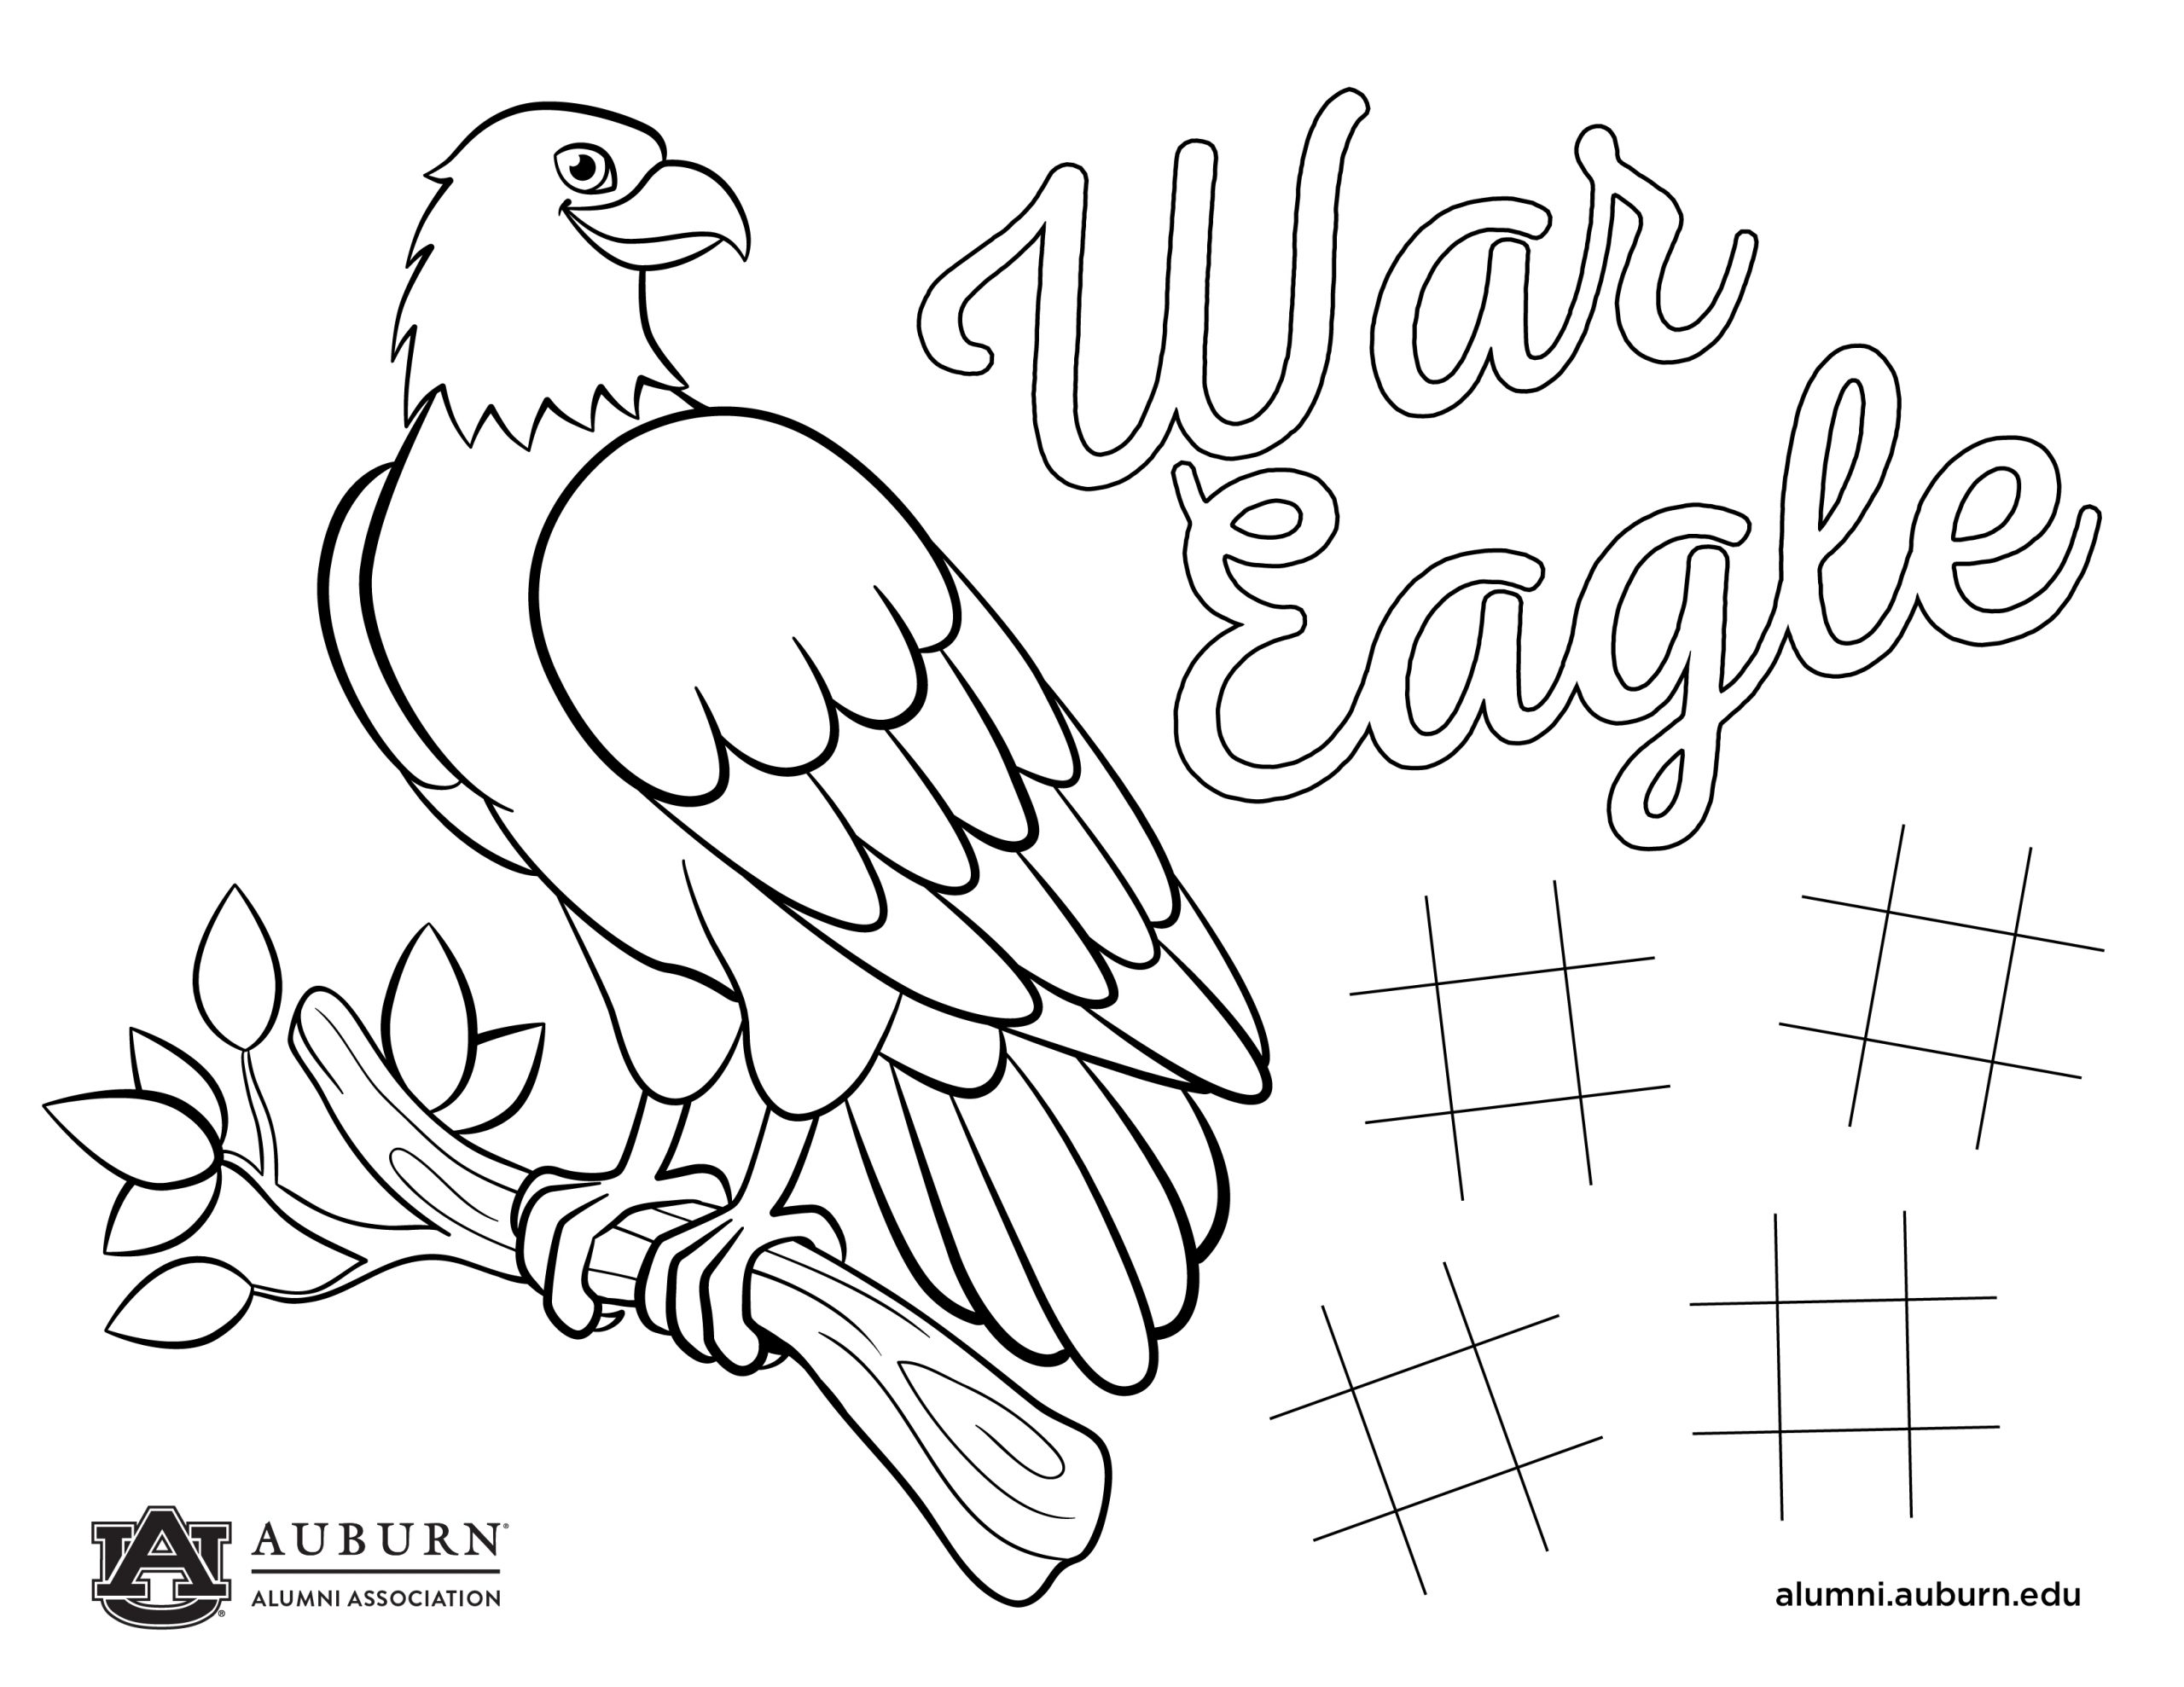 War Eagle Coloring and Activity tic tac toe